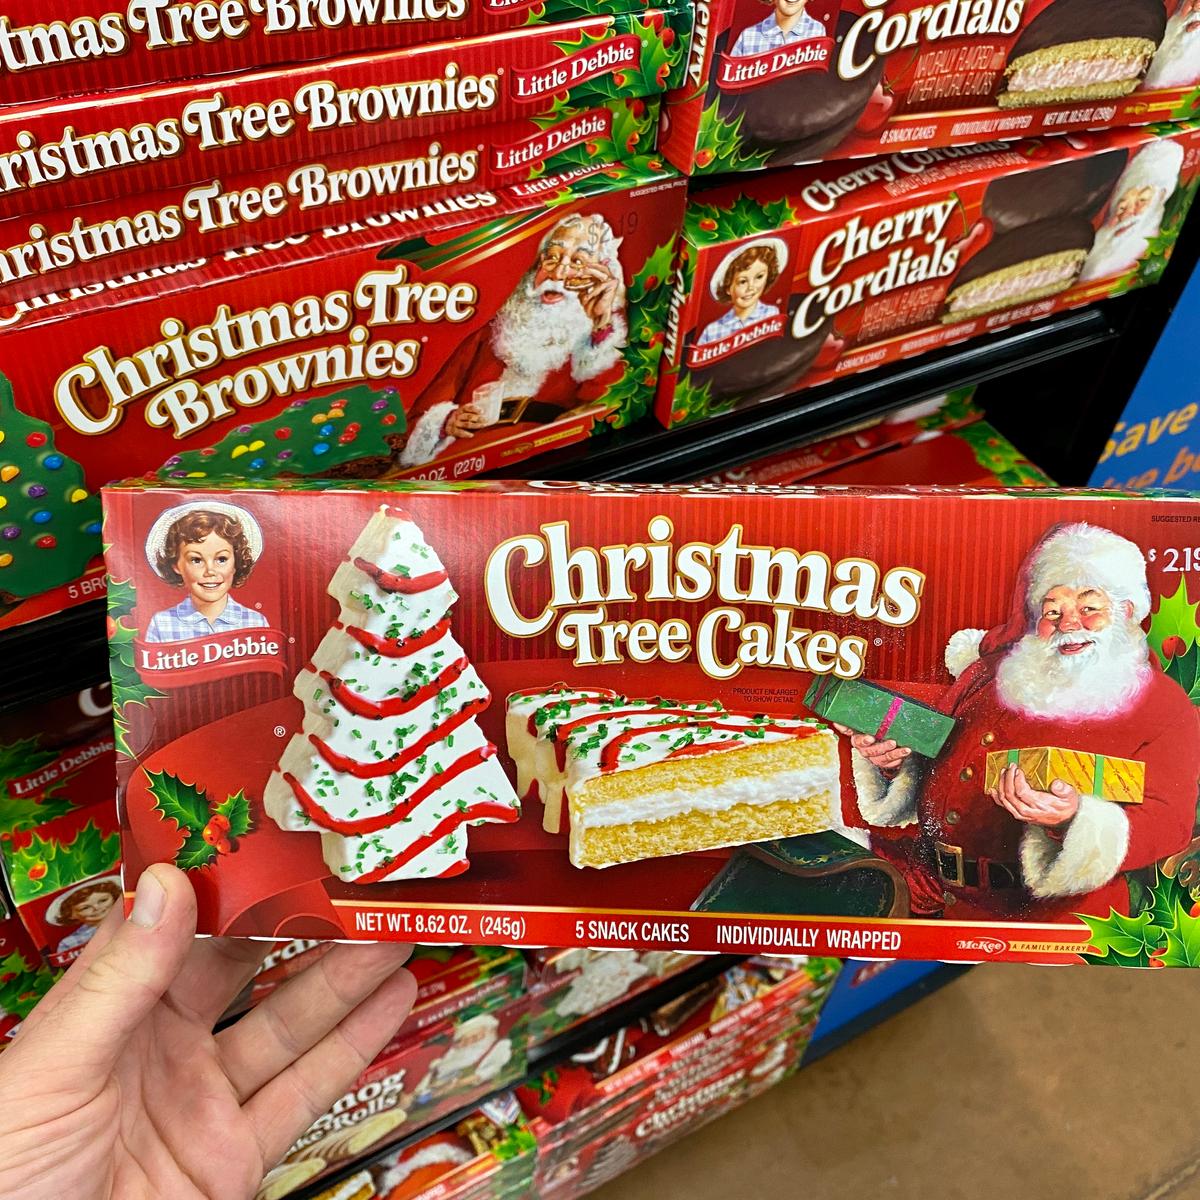 Little Debbie Christmas Tree Ice Cream is Here!